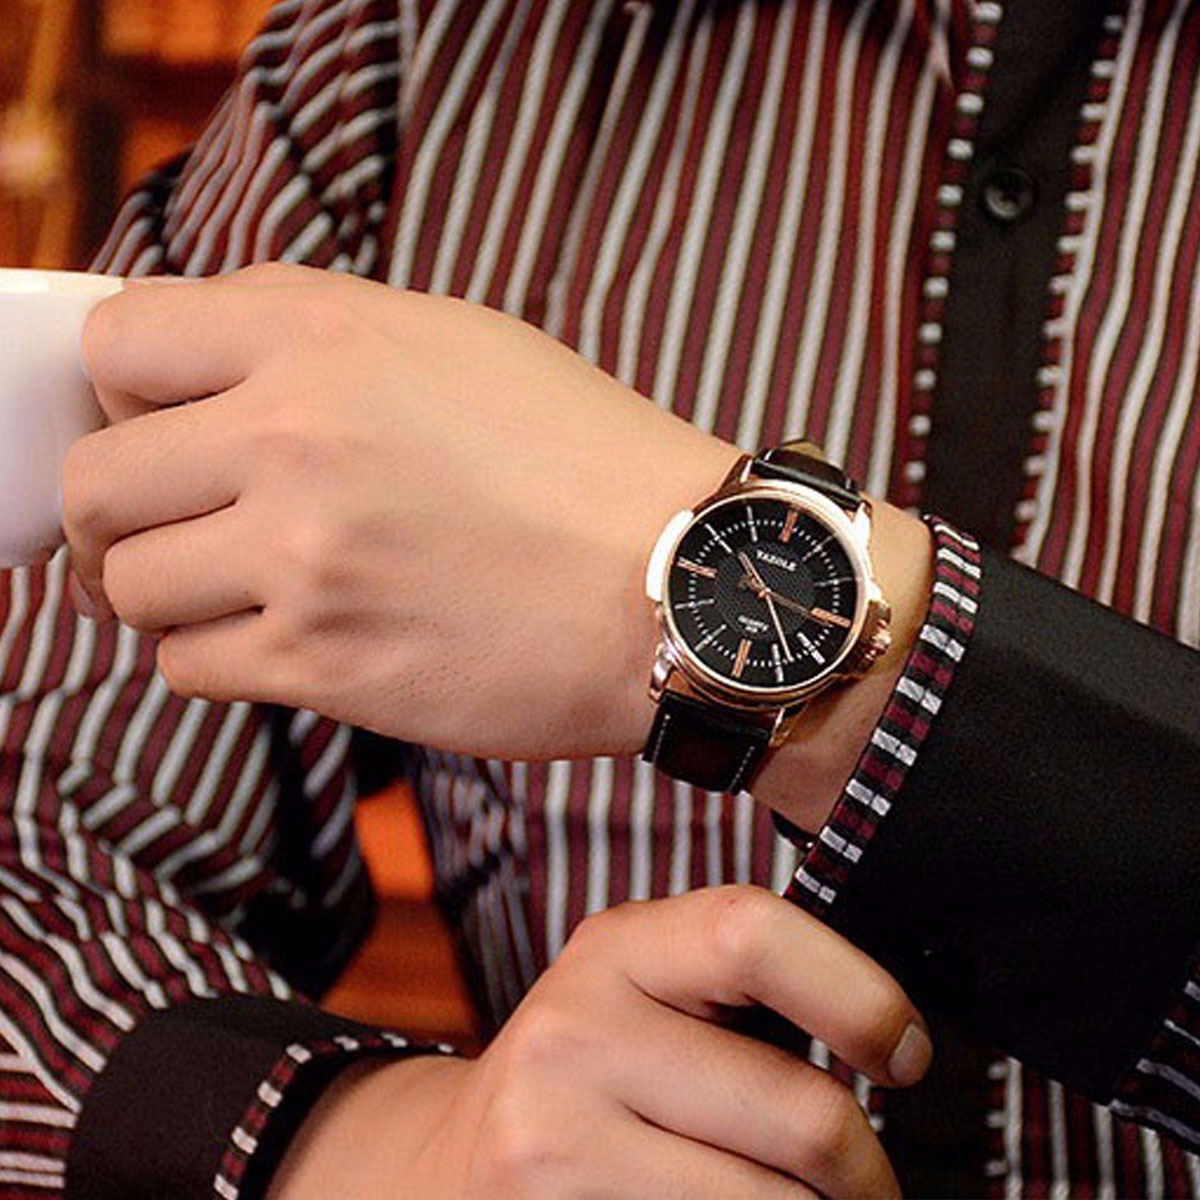 b629a9e39 relógios luxo masculinos barato yazole n4 menor preço. Carregando zoom.